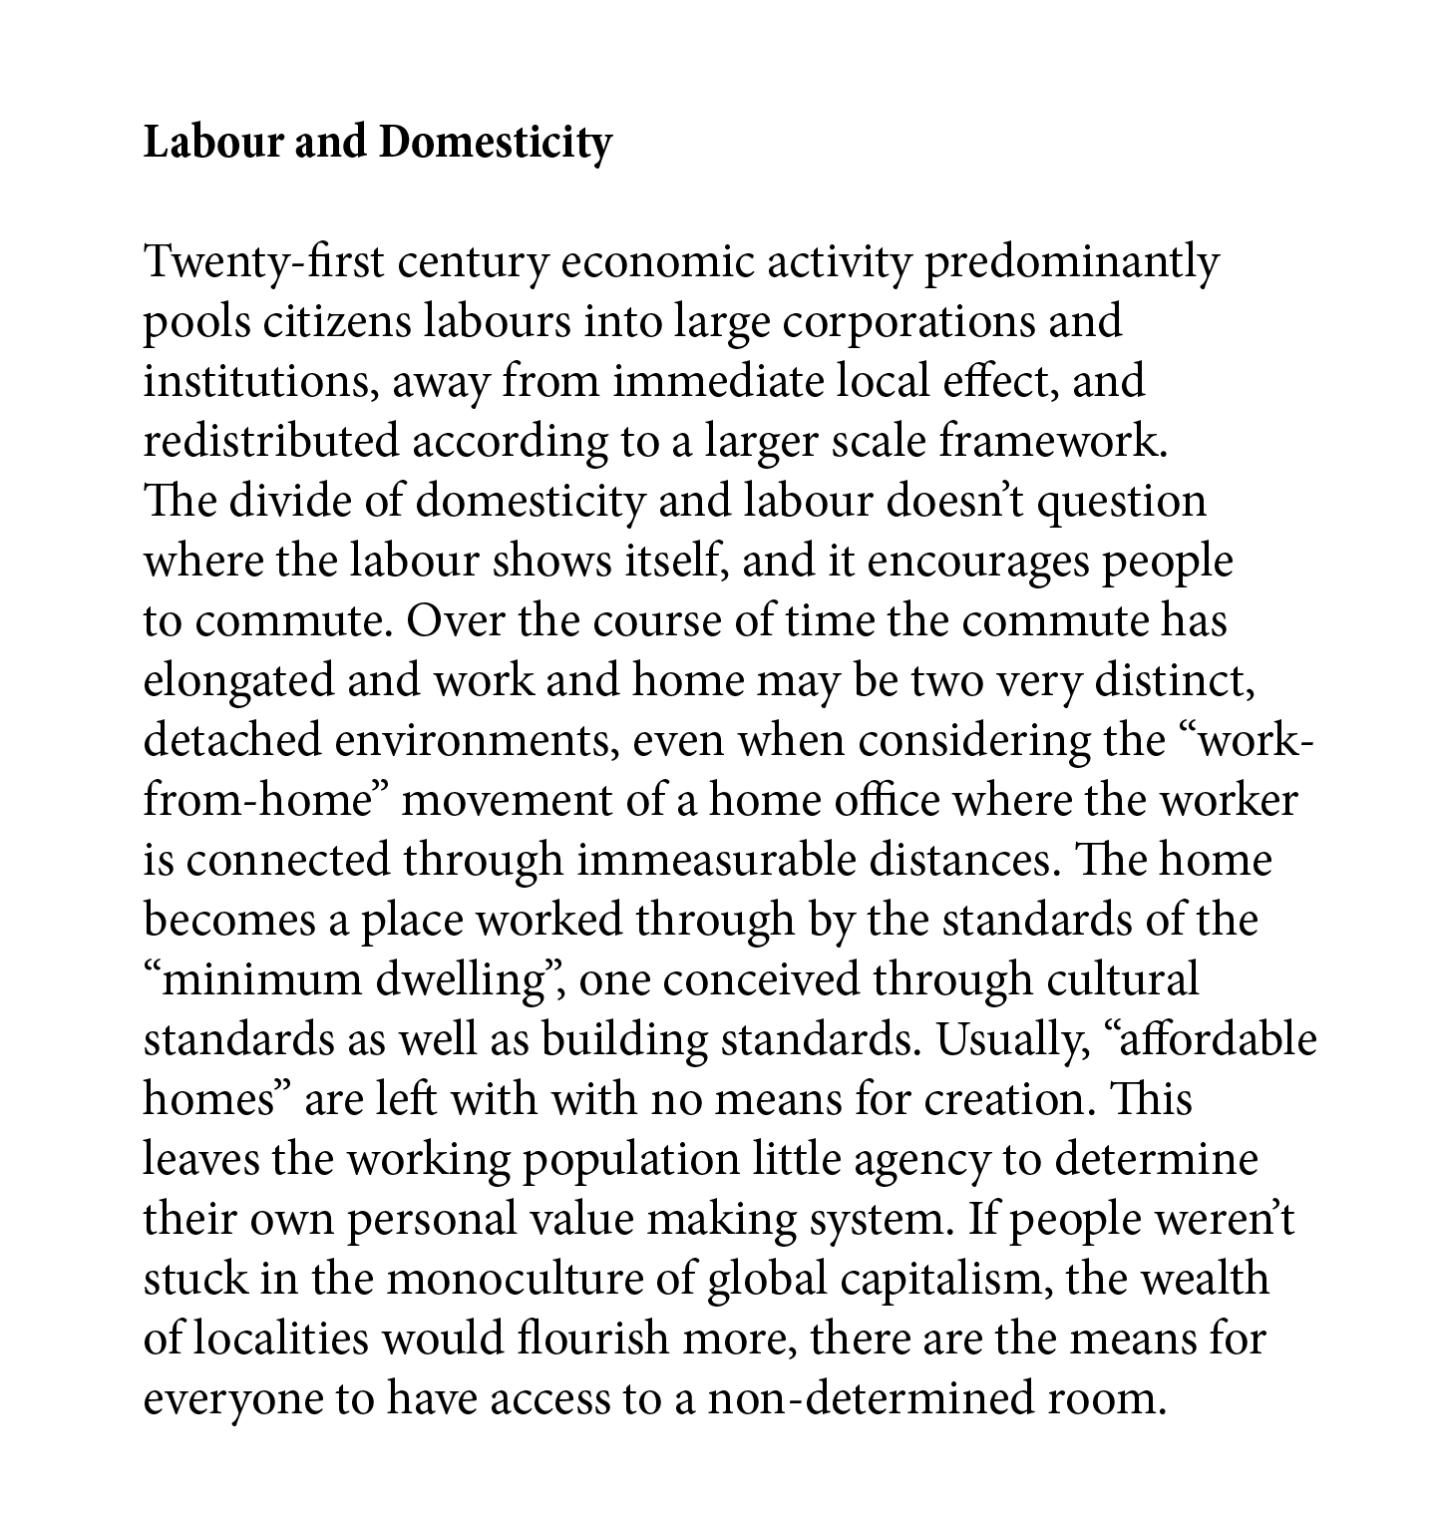 Labour and domesticity